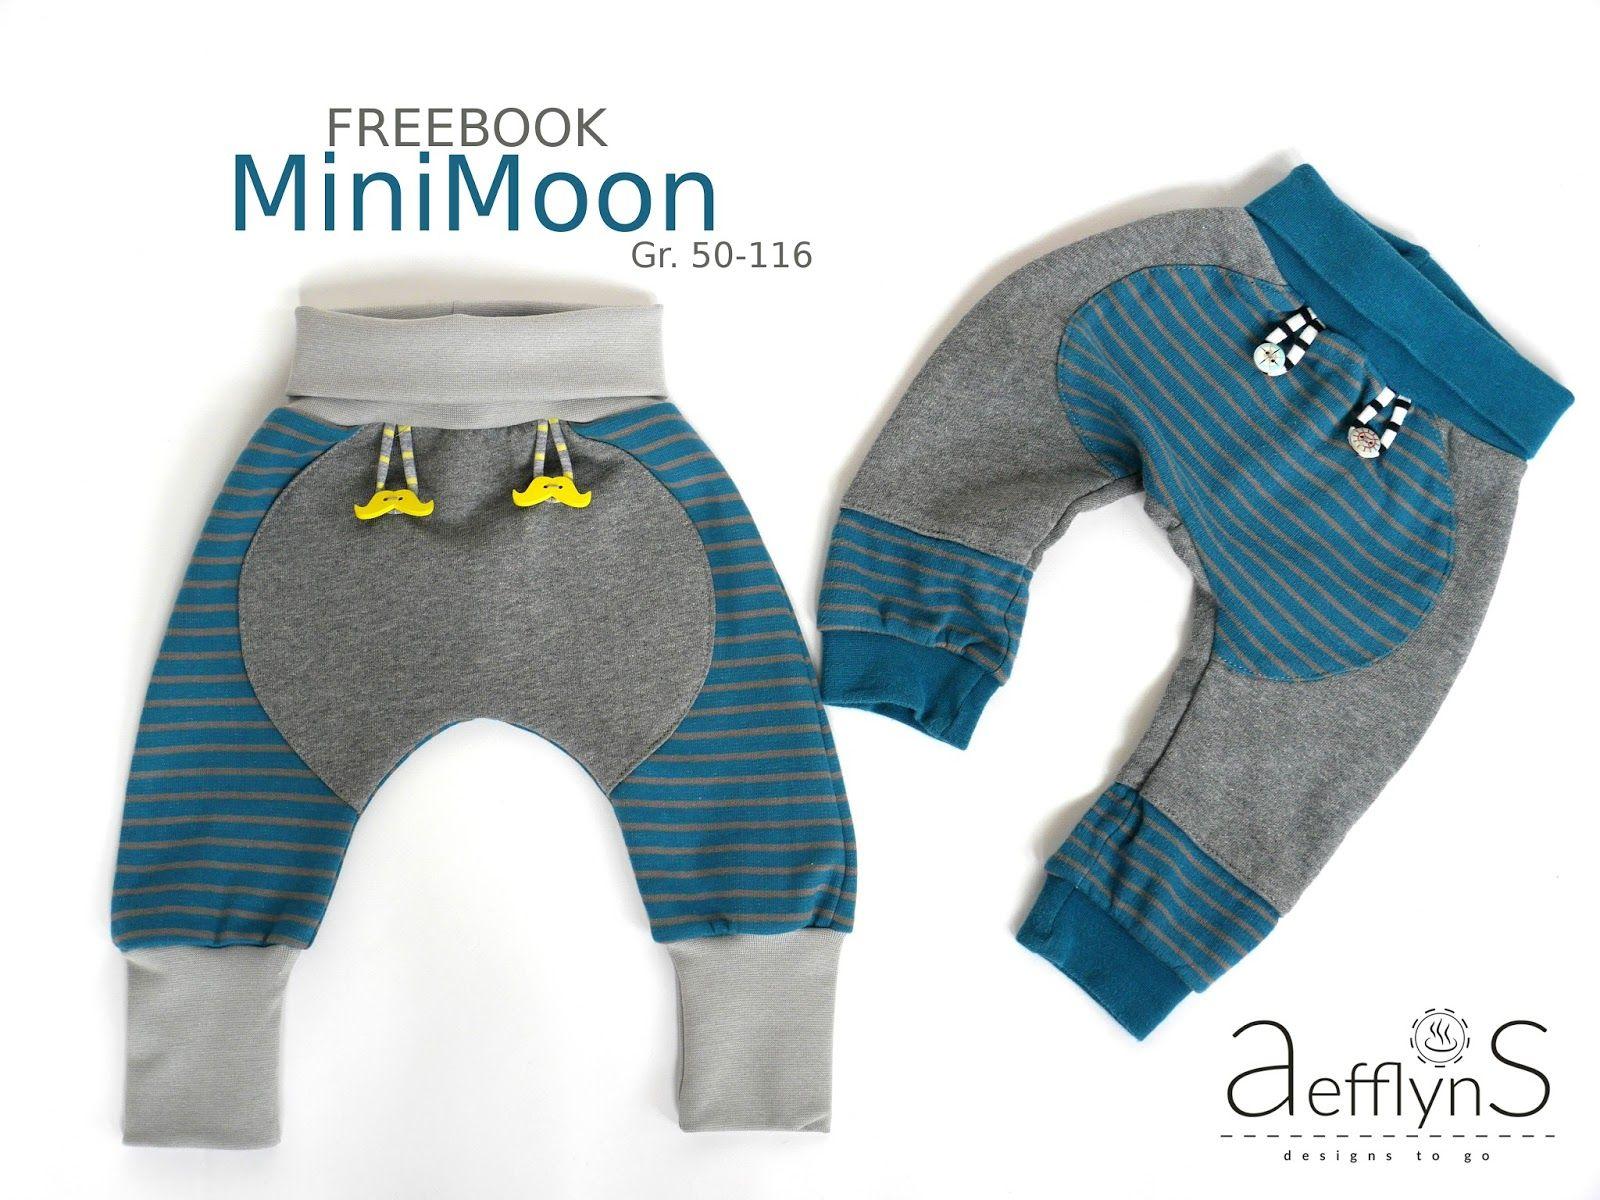 neueste Kollektion Rabatt bis zu 60% billig zu verkaufen Mini Moon freebook Pumphose | Anleitungen | Baby nähen ...